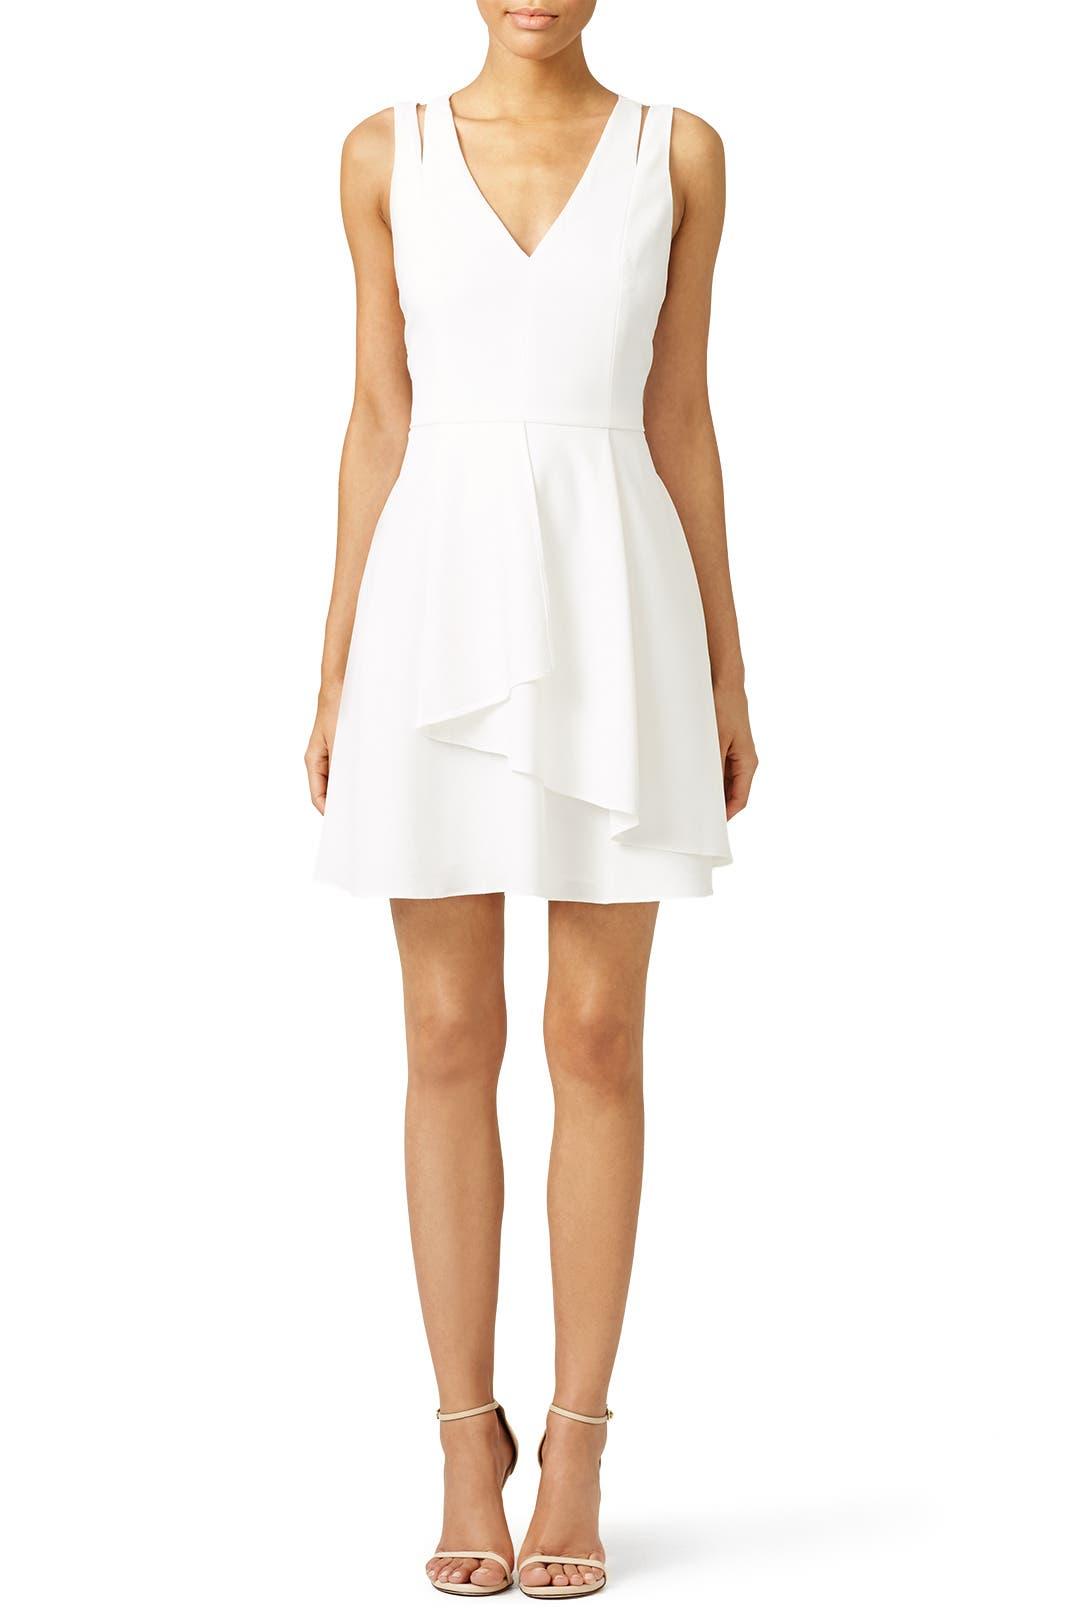 4b6cdbaa5279c White Double Ruffle Dress by Adelyn Rae for  30 -  40